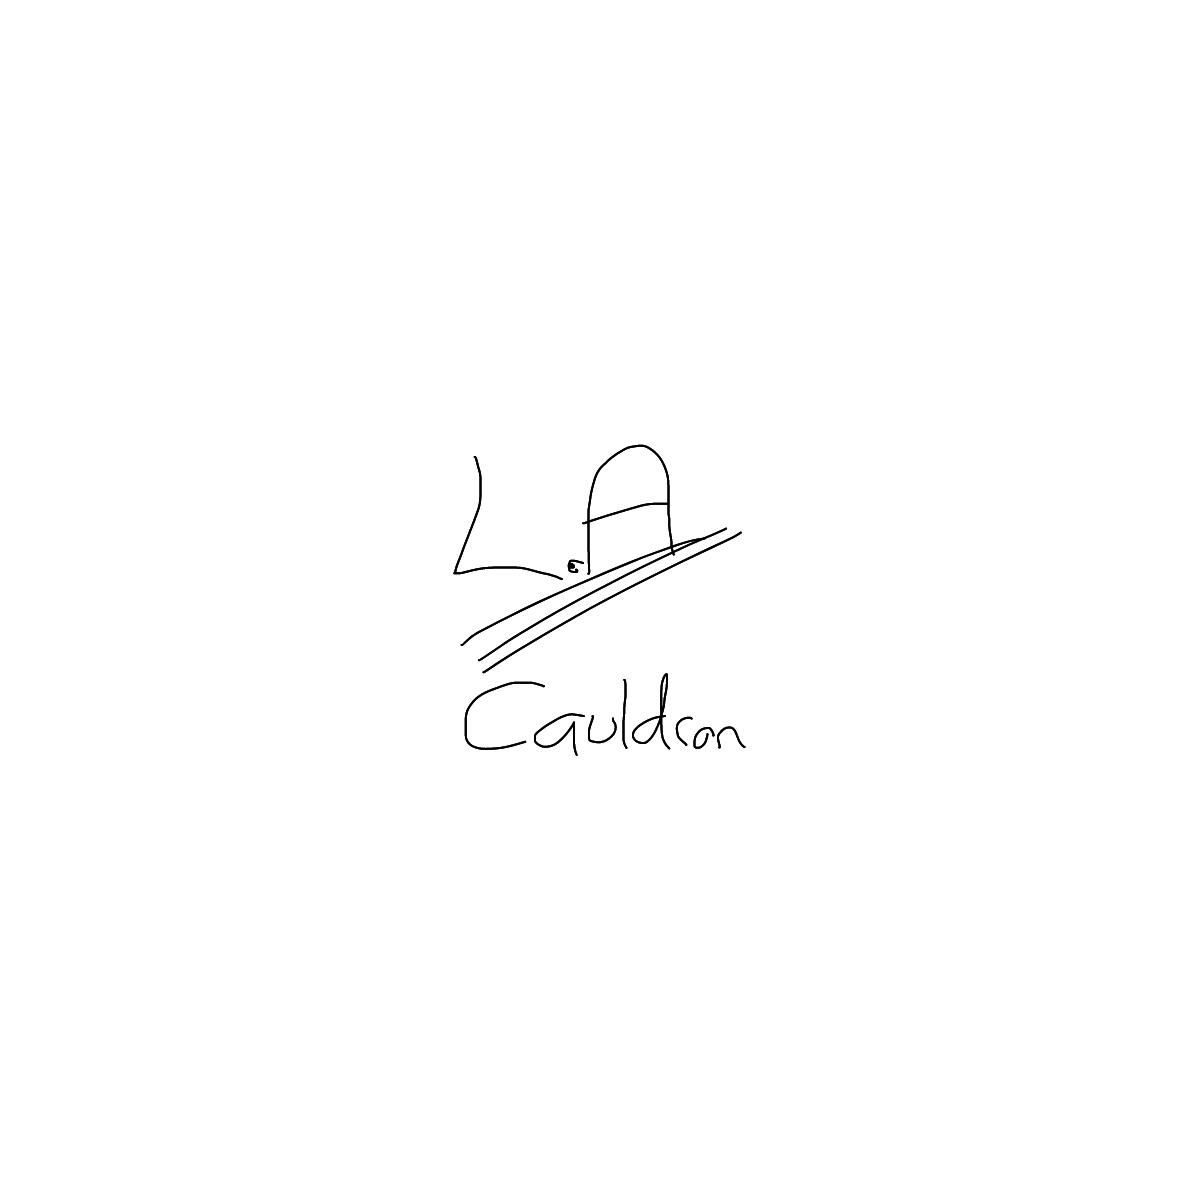 BAAAM drawing#24651 lat:52.2192649841308600lng: -0.2842708528041840